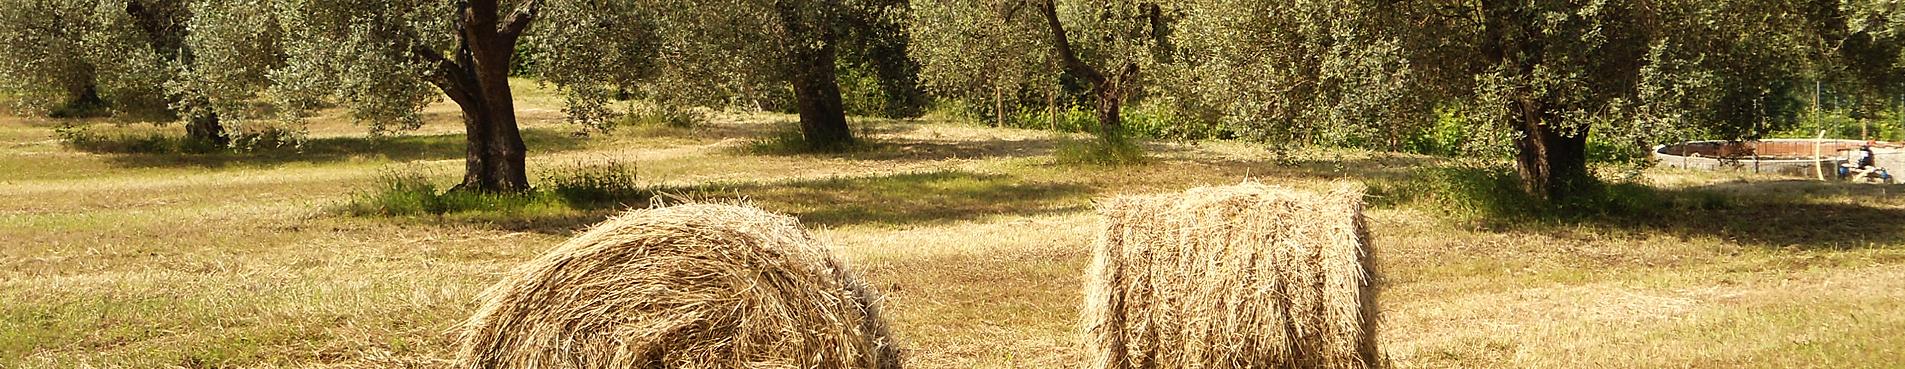 Uliveta Agriturismo Aria Toscana